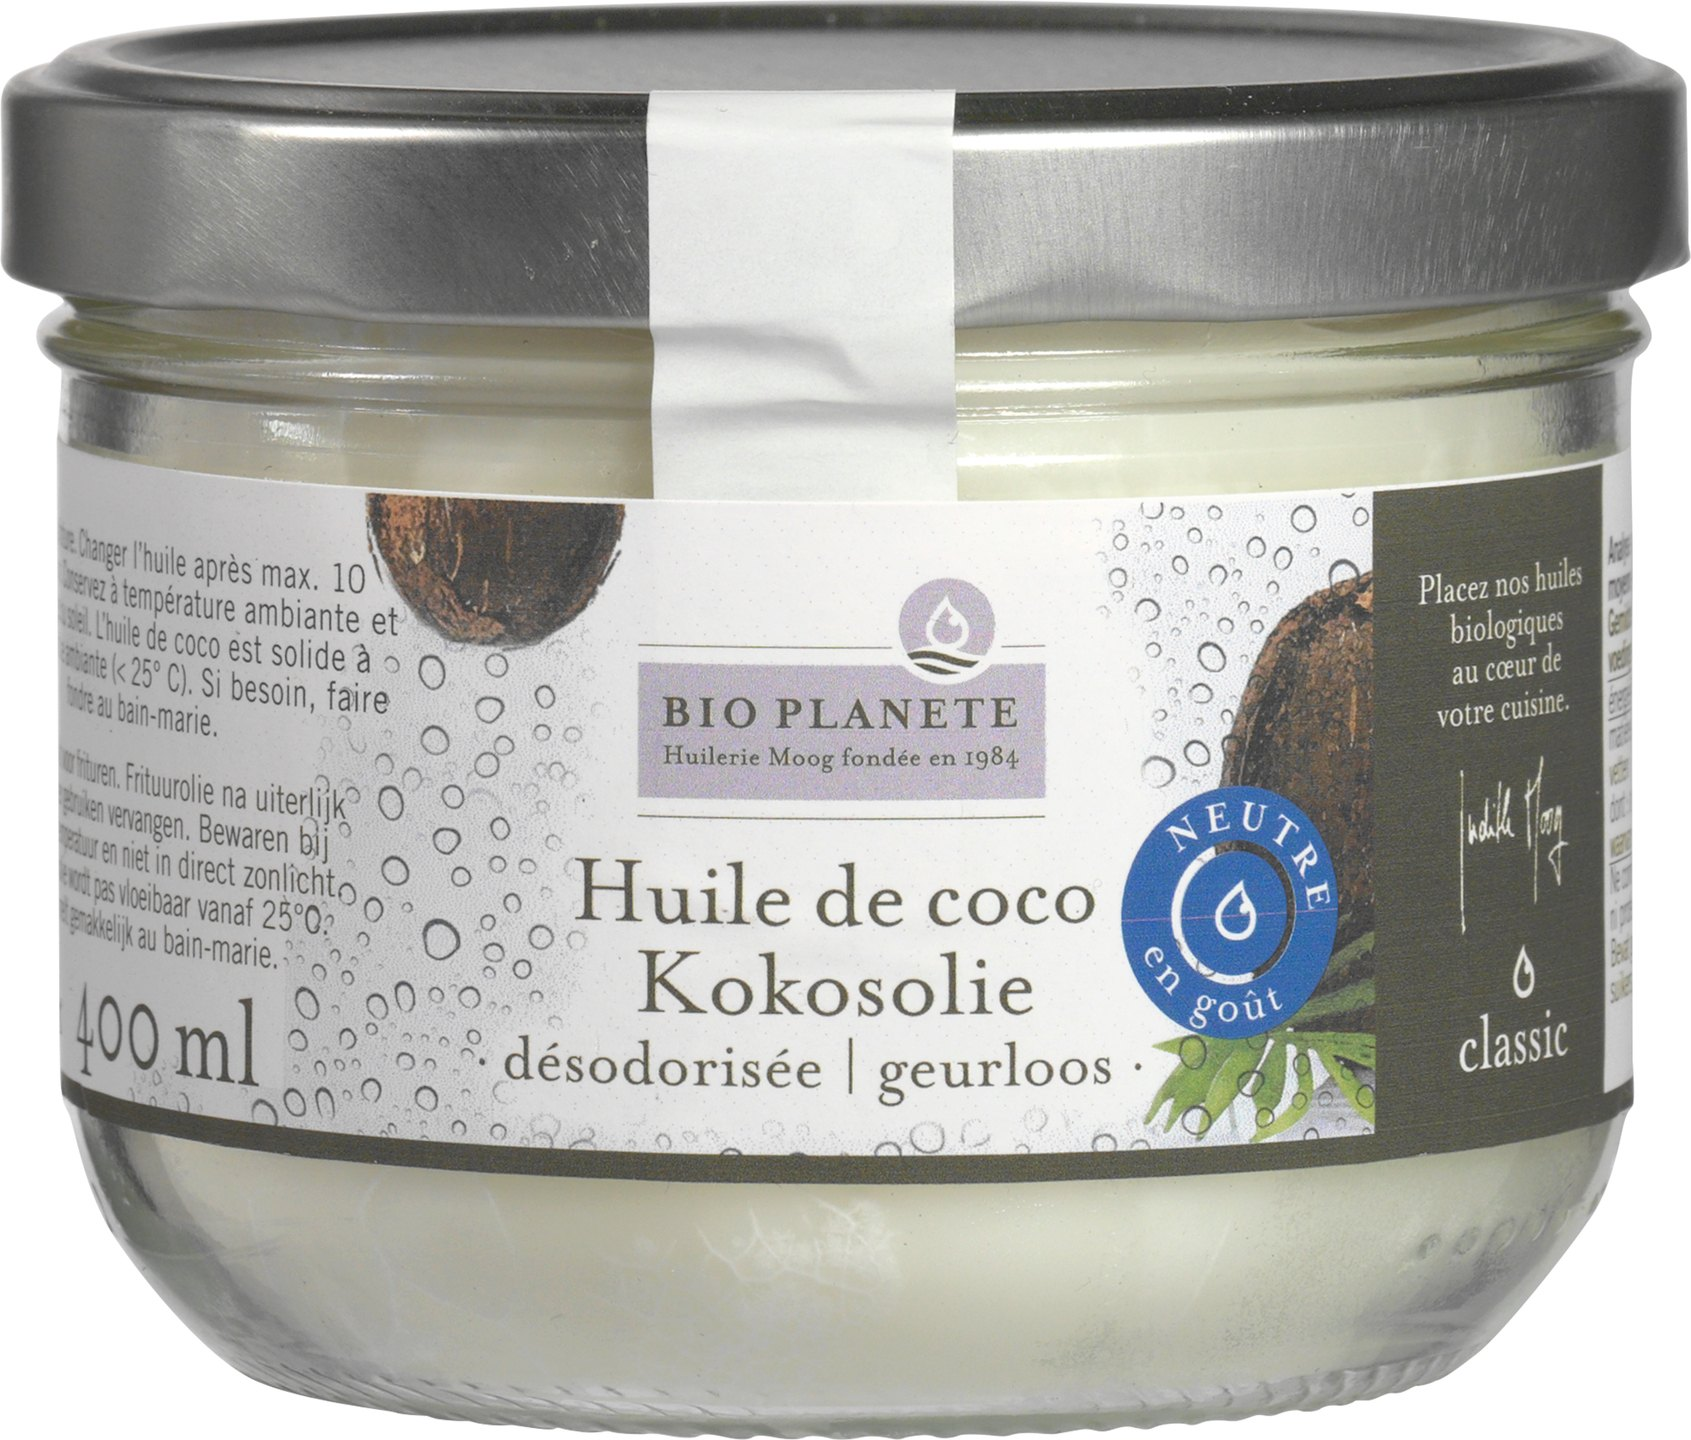 Biologische Bio Planète Kokosolie neutraal 400 ml